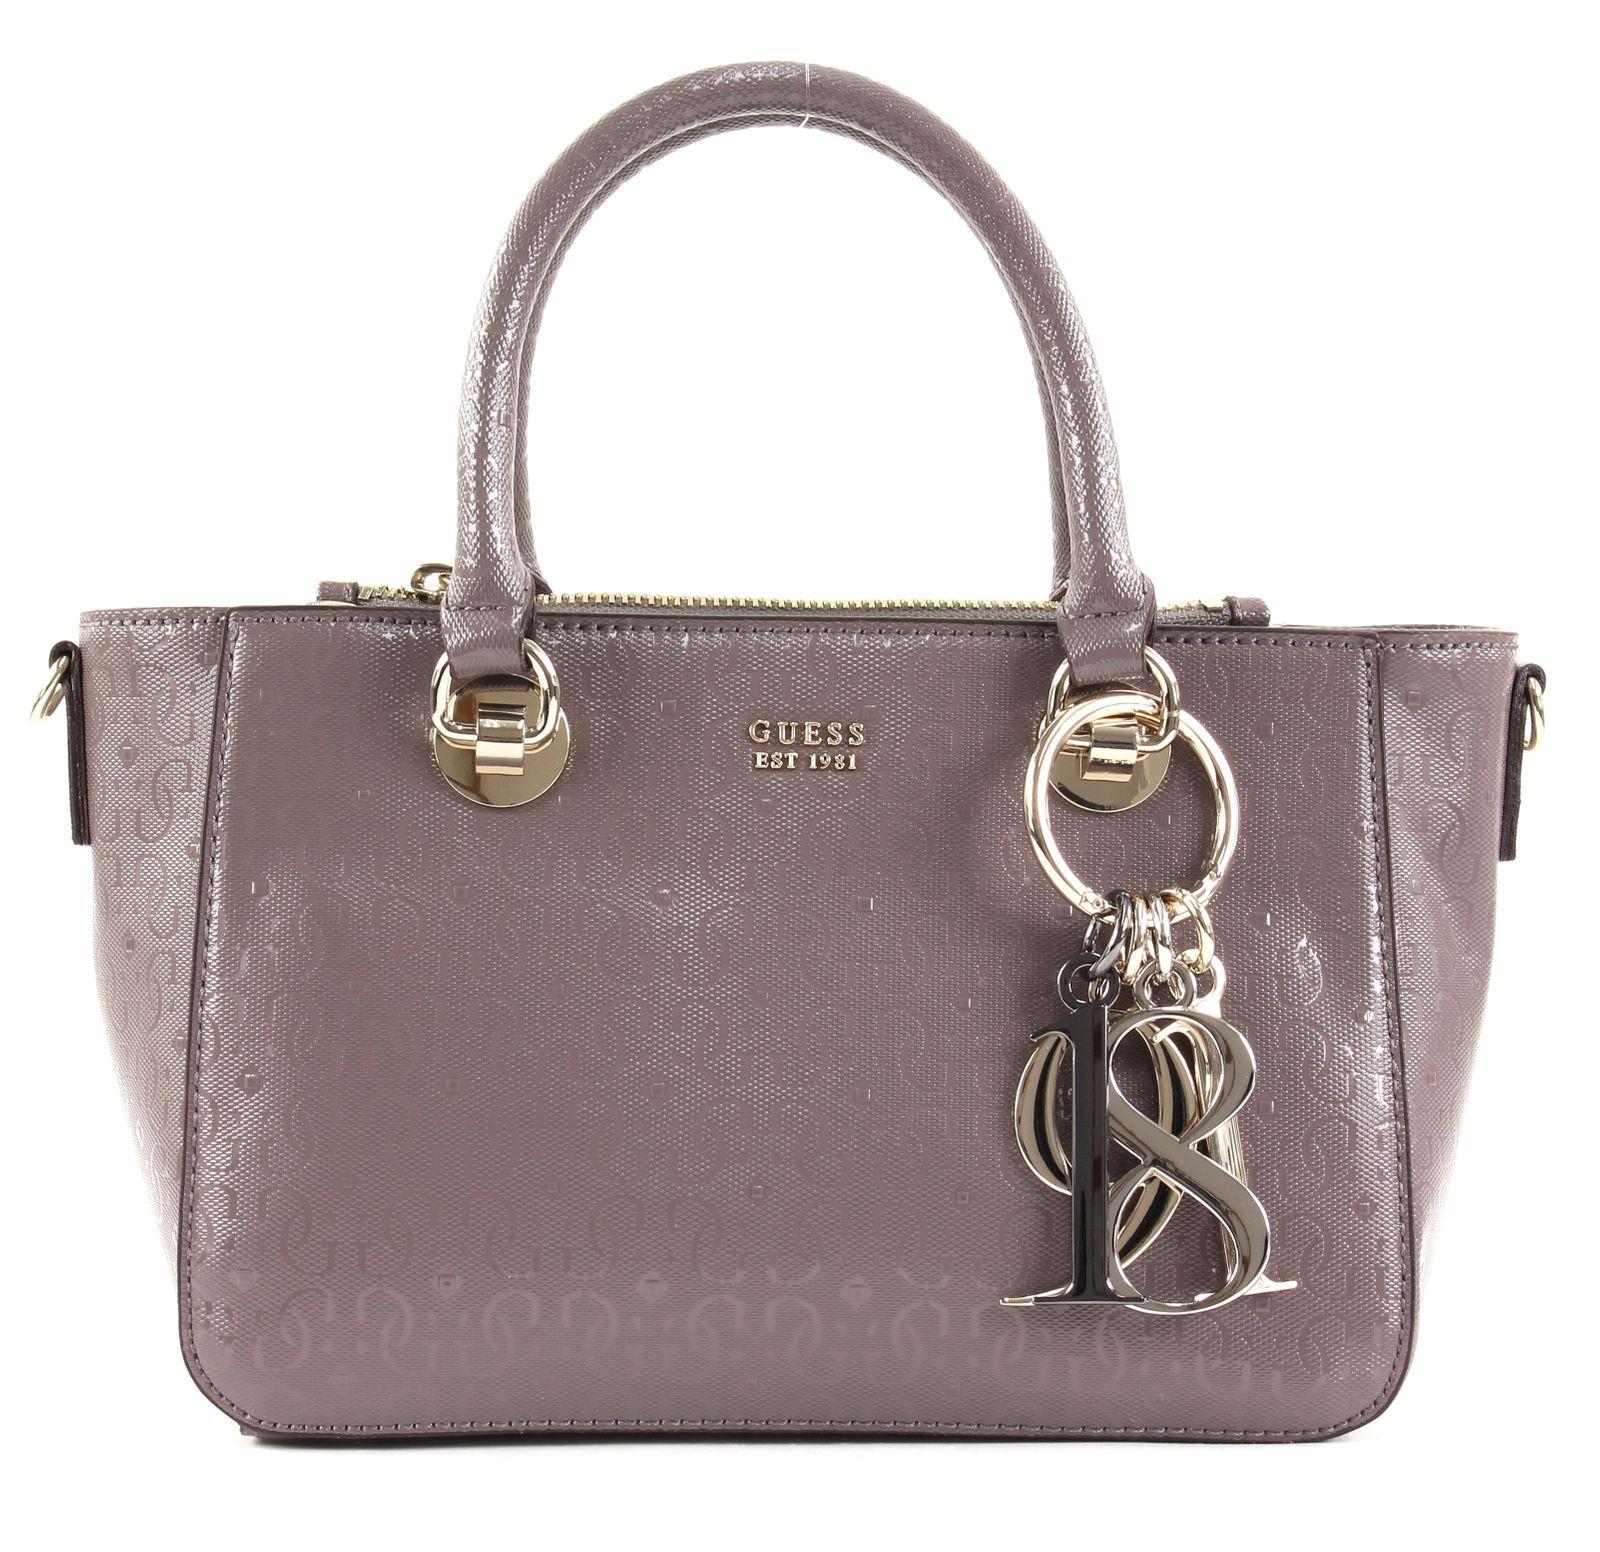 Details zu GUESS Tamra Small Society Satchel Handtasche Tasche Taupe Braun Neu